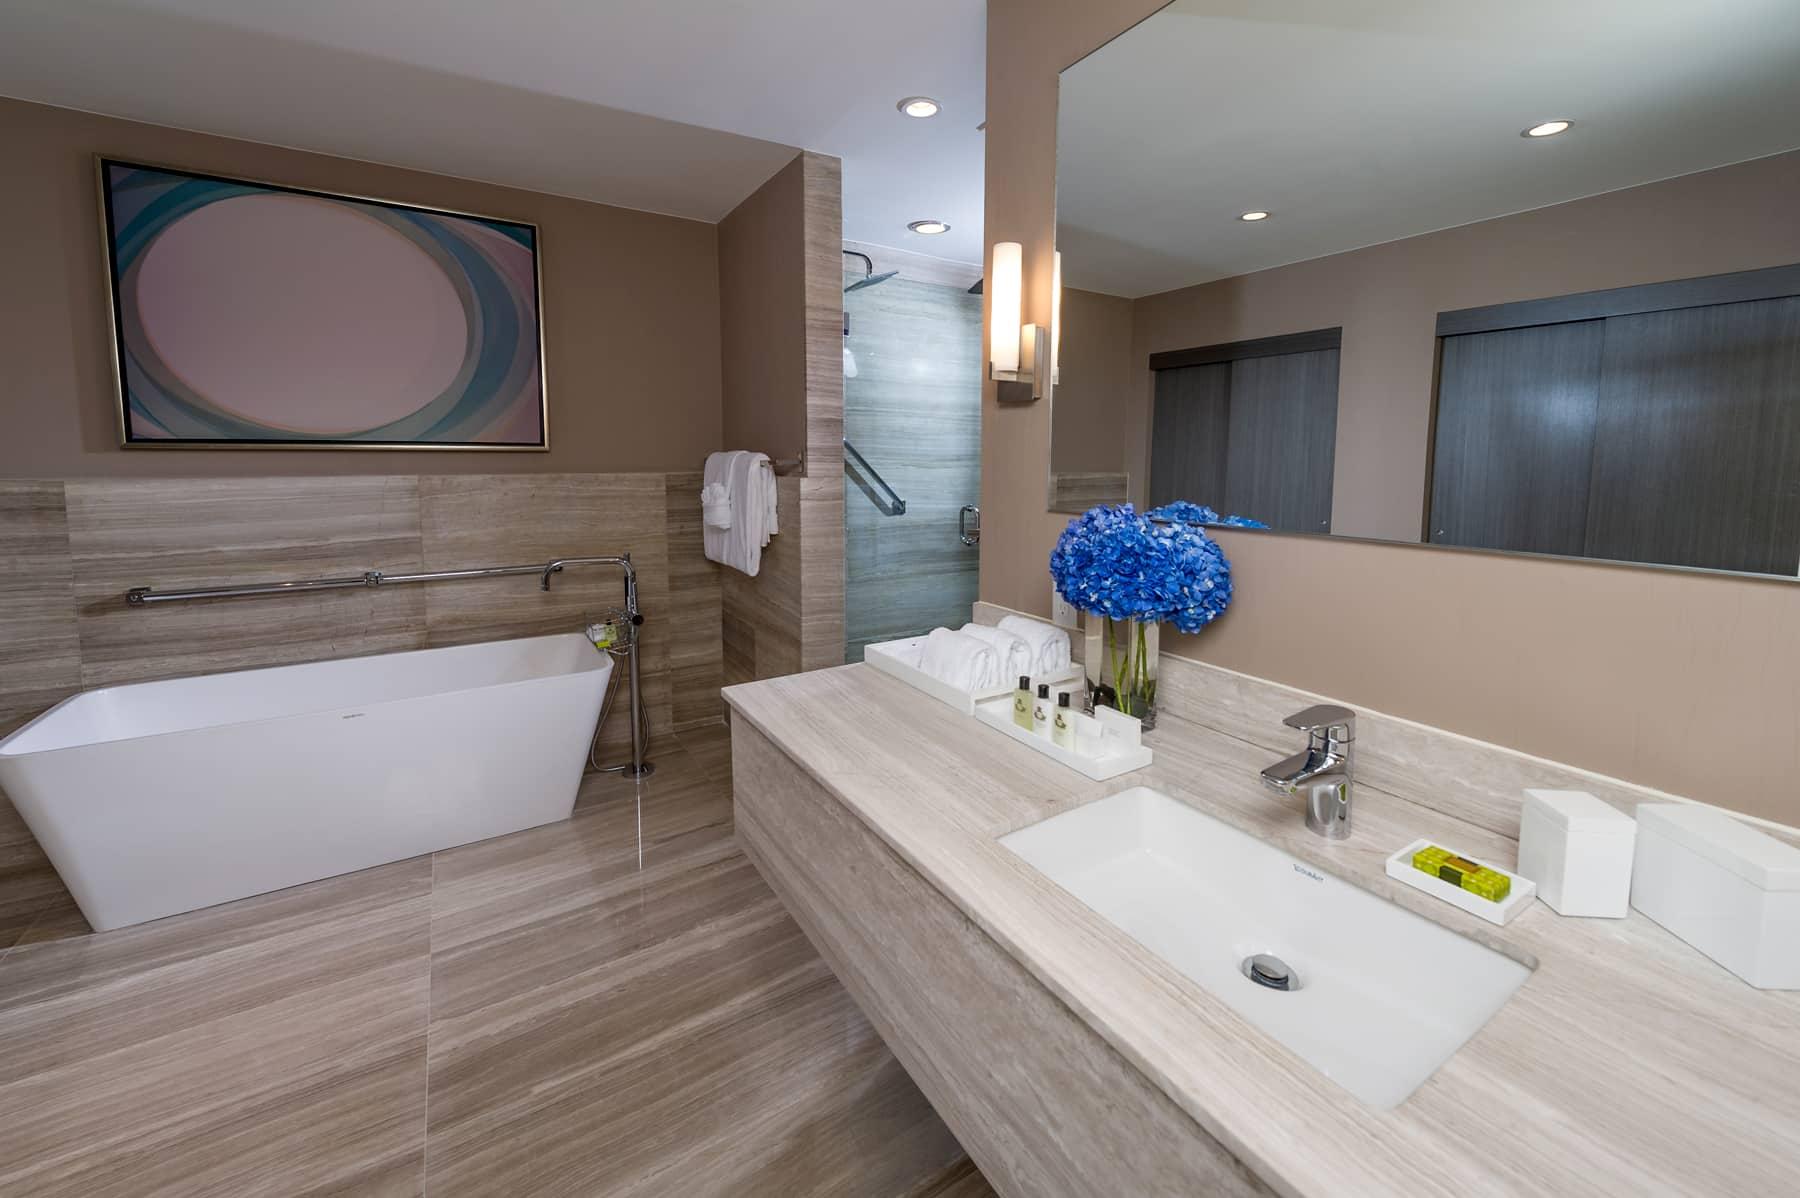 Intercontinental Hotel   Bathroom   Miami, FL   Hospitality   Interior Designers